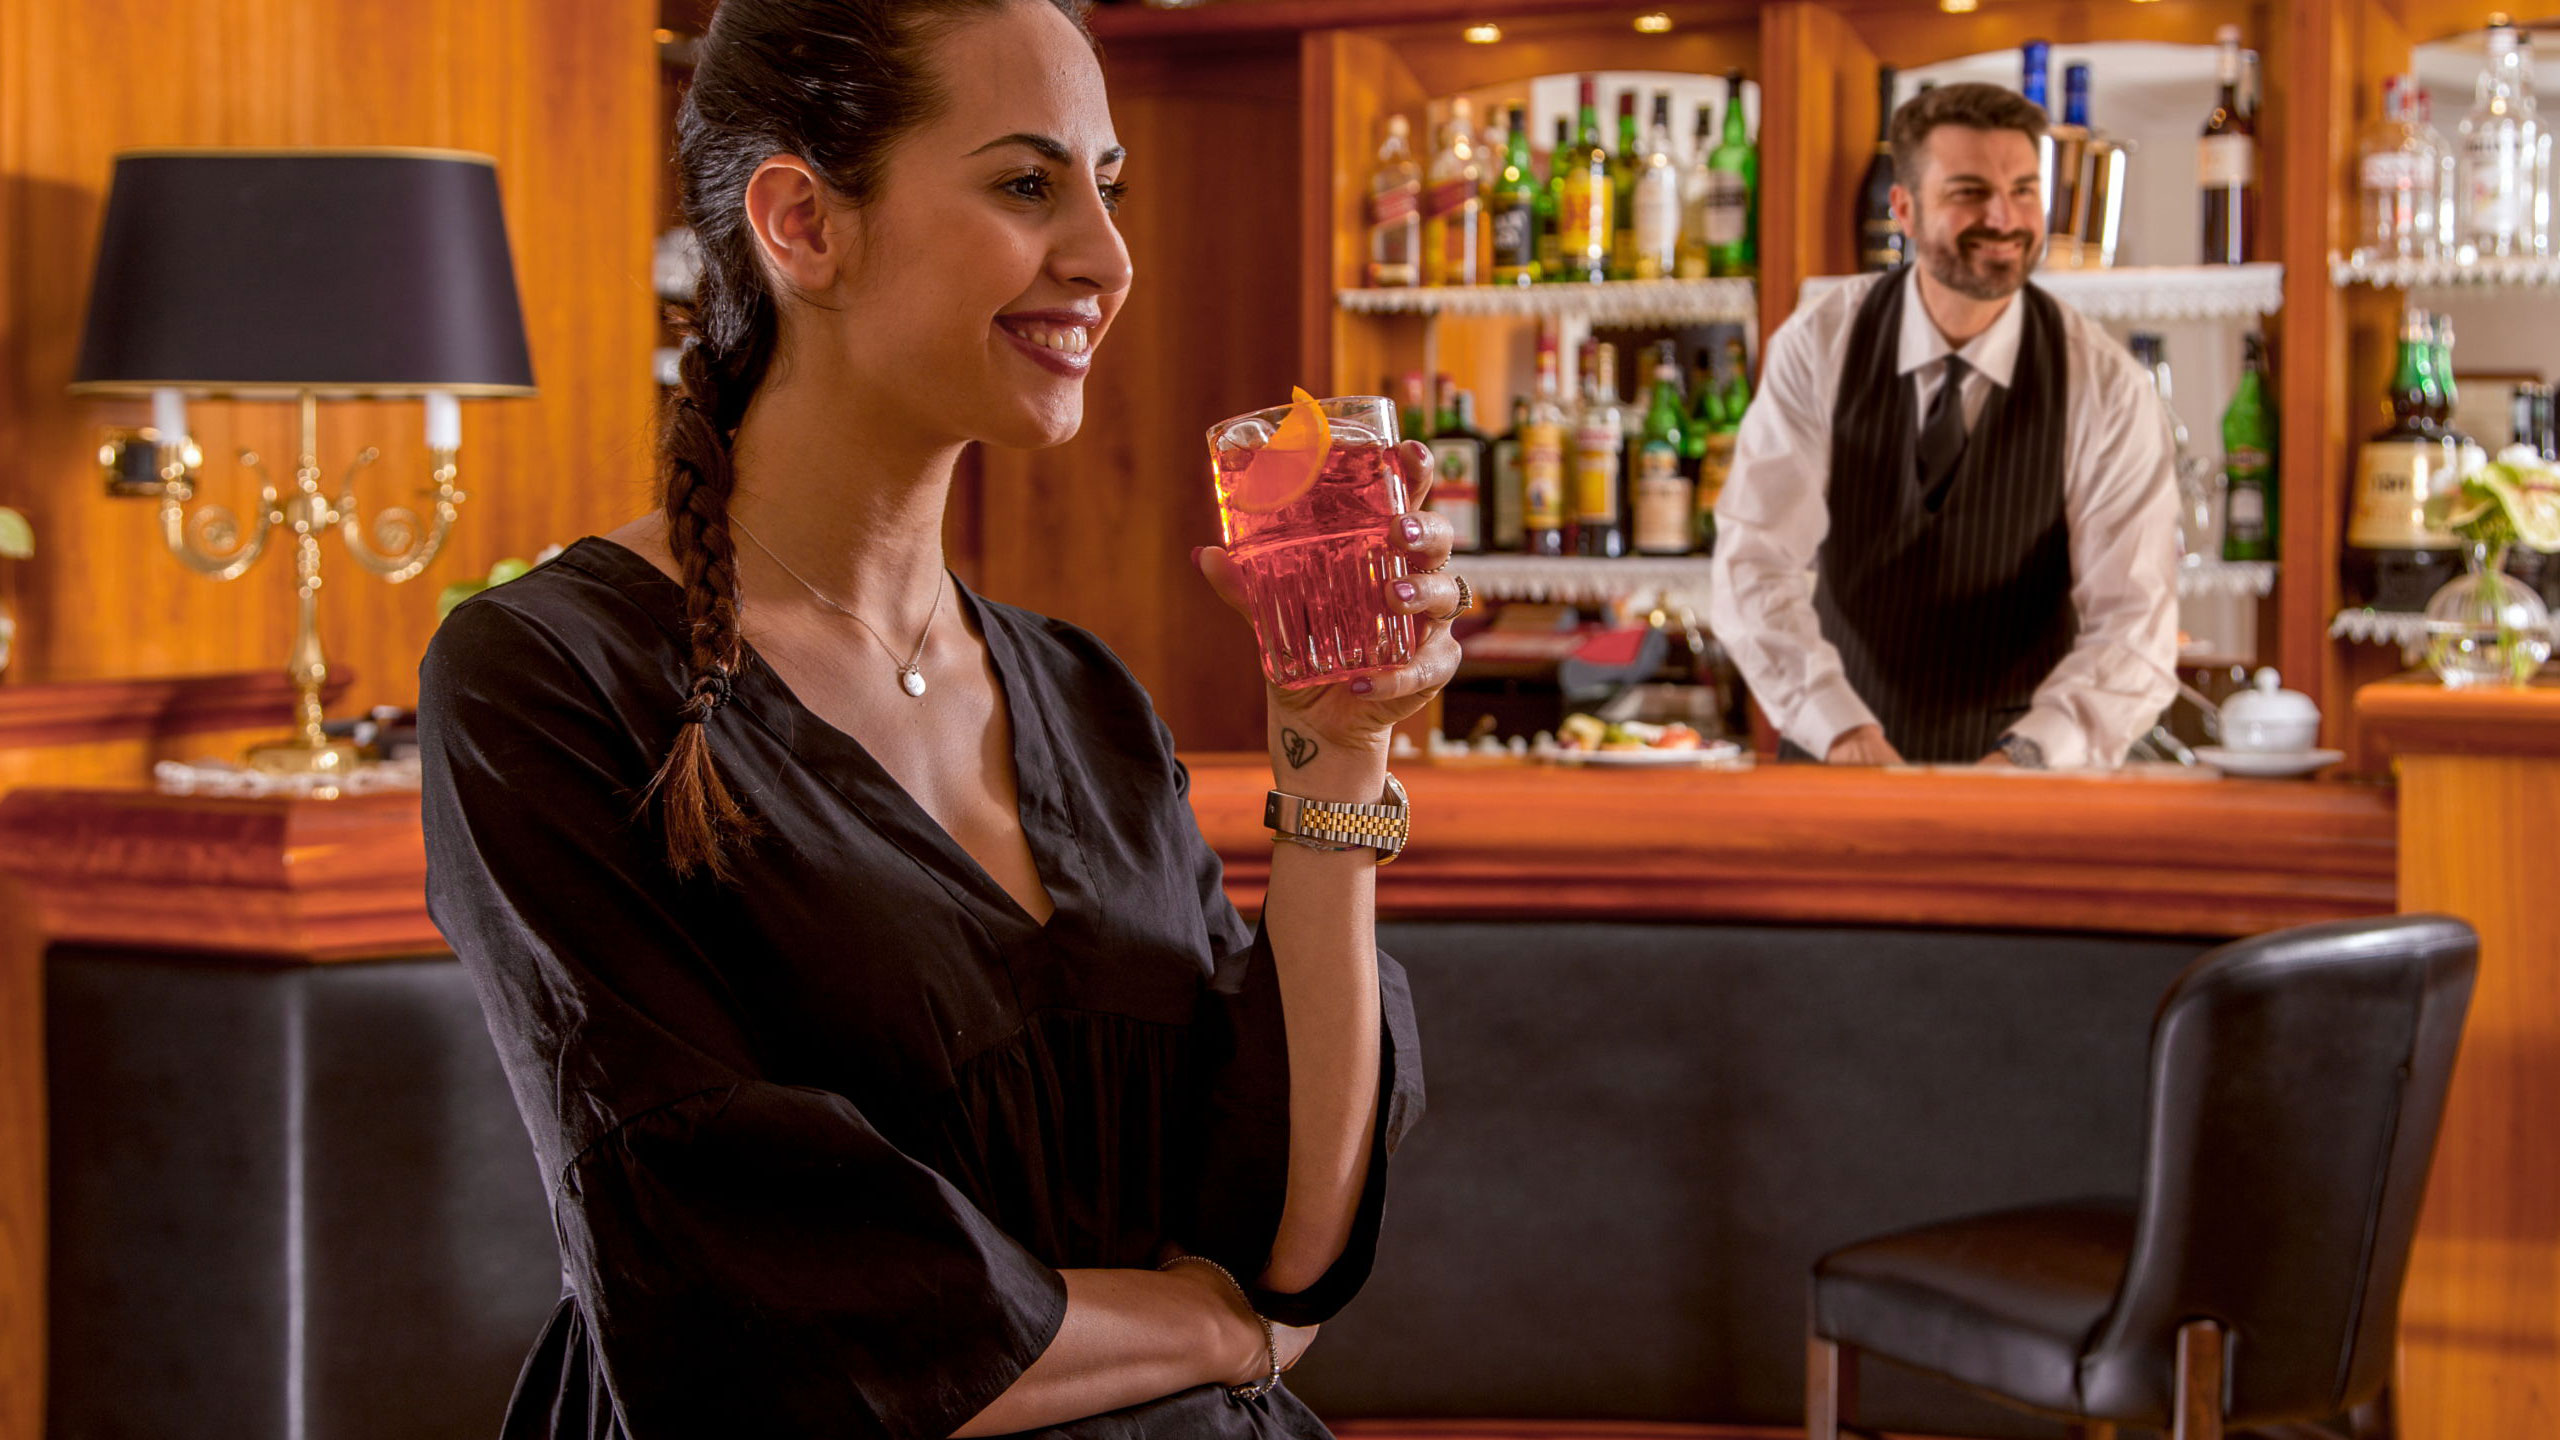 albergo-ottocento-roma-bar-04